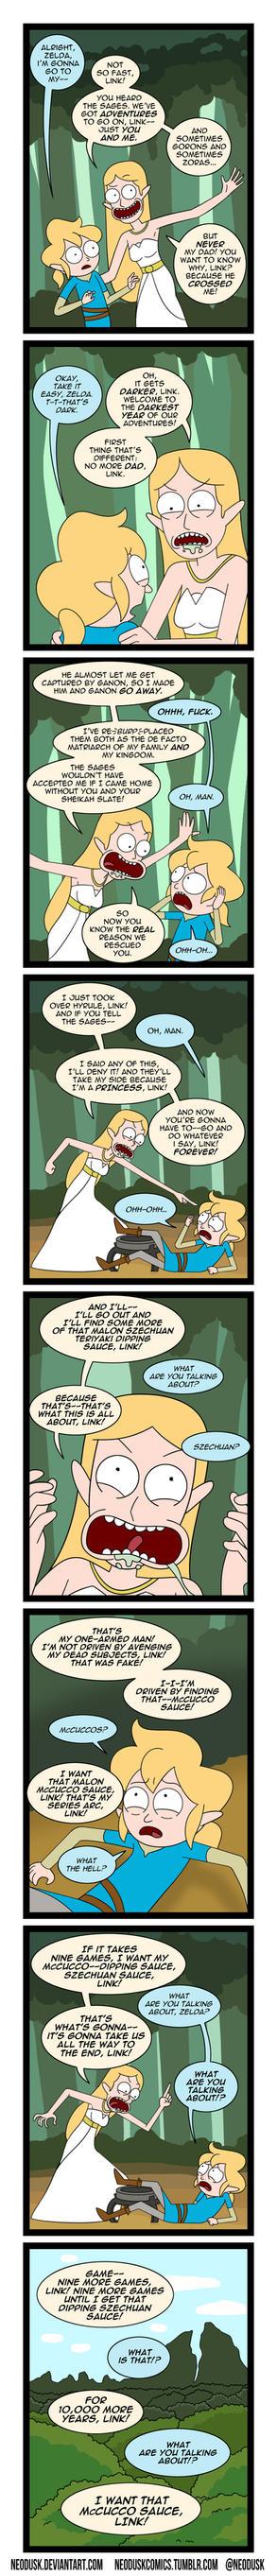 Link and Zelda Season 3 Episode 1 by Neodusk